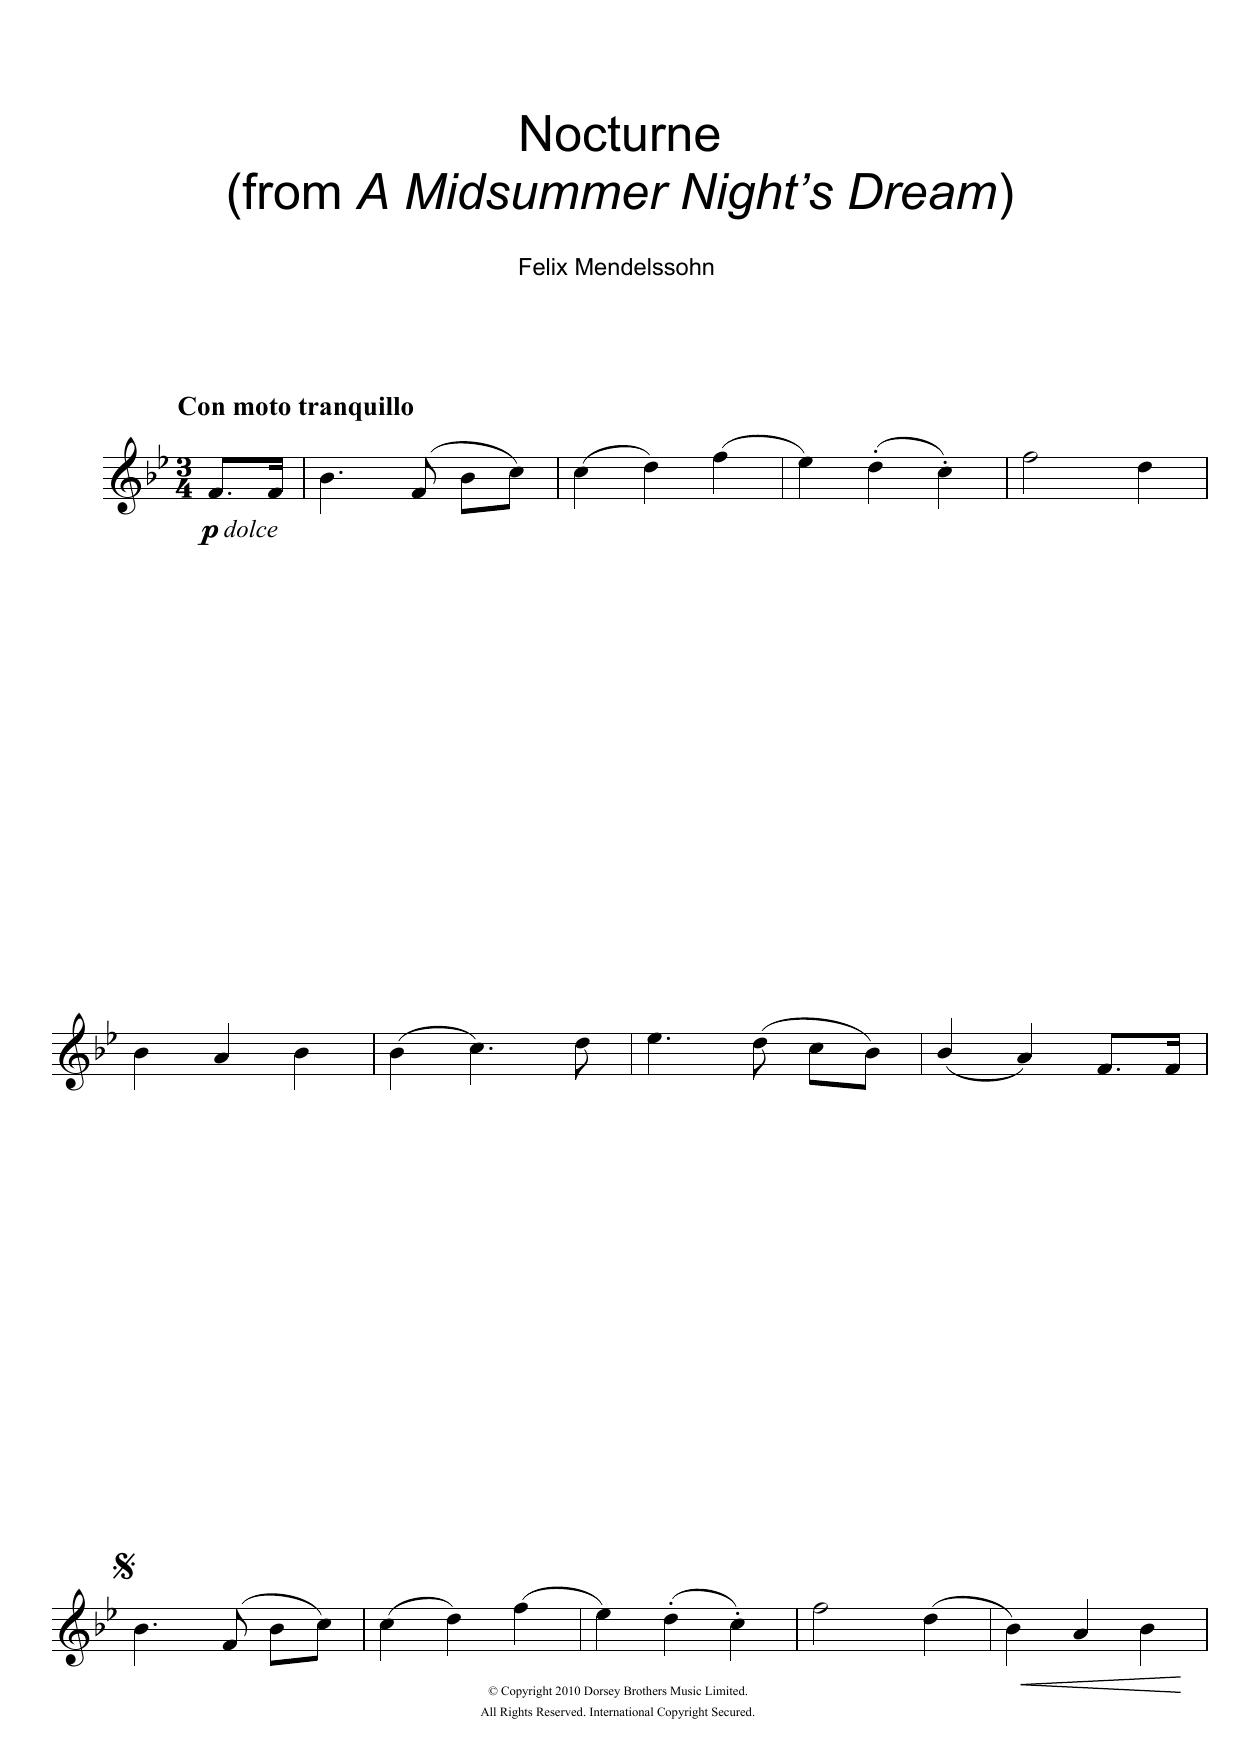 Nocturne (from A Midsummer Night's Dream) sheet music